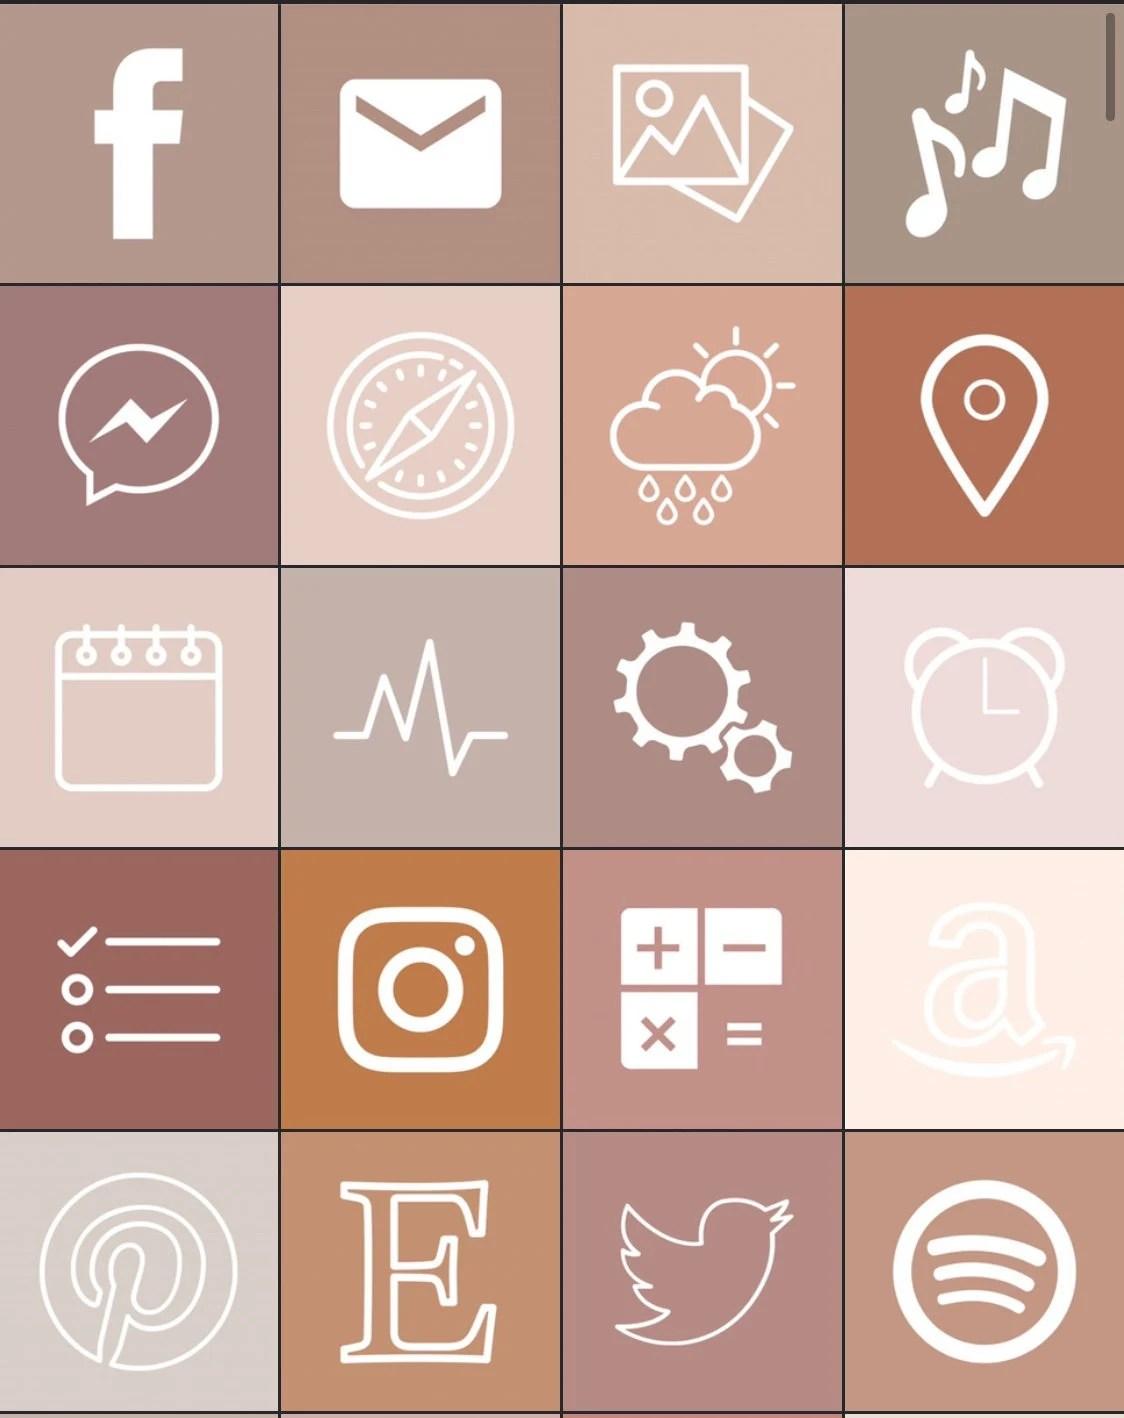 660 soft forrest sage earthy neutral aesthetic app icons. 34 Boho Aesthetic iOS 14 iPhone App Icons Neutral Boho ...